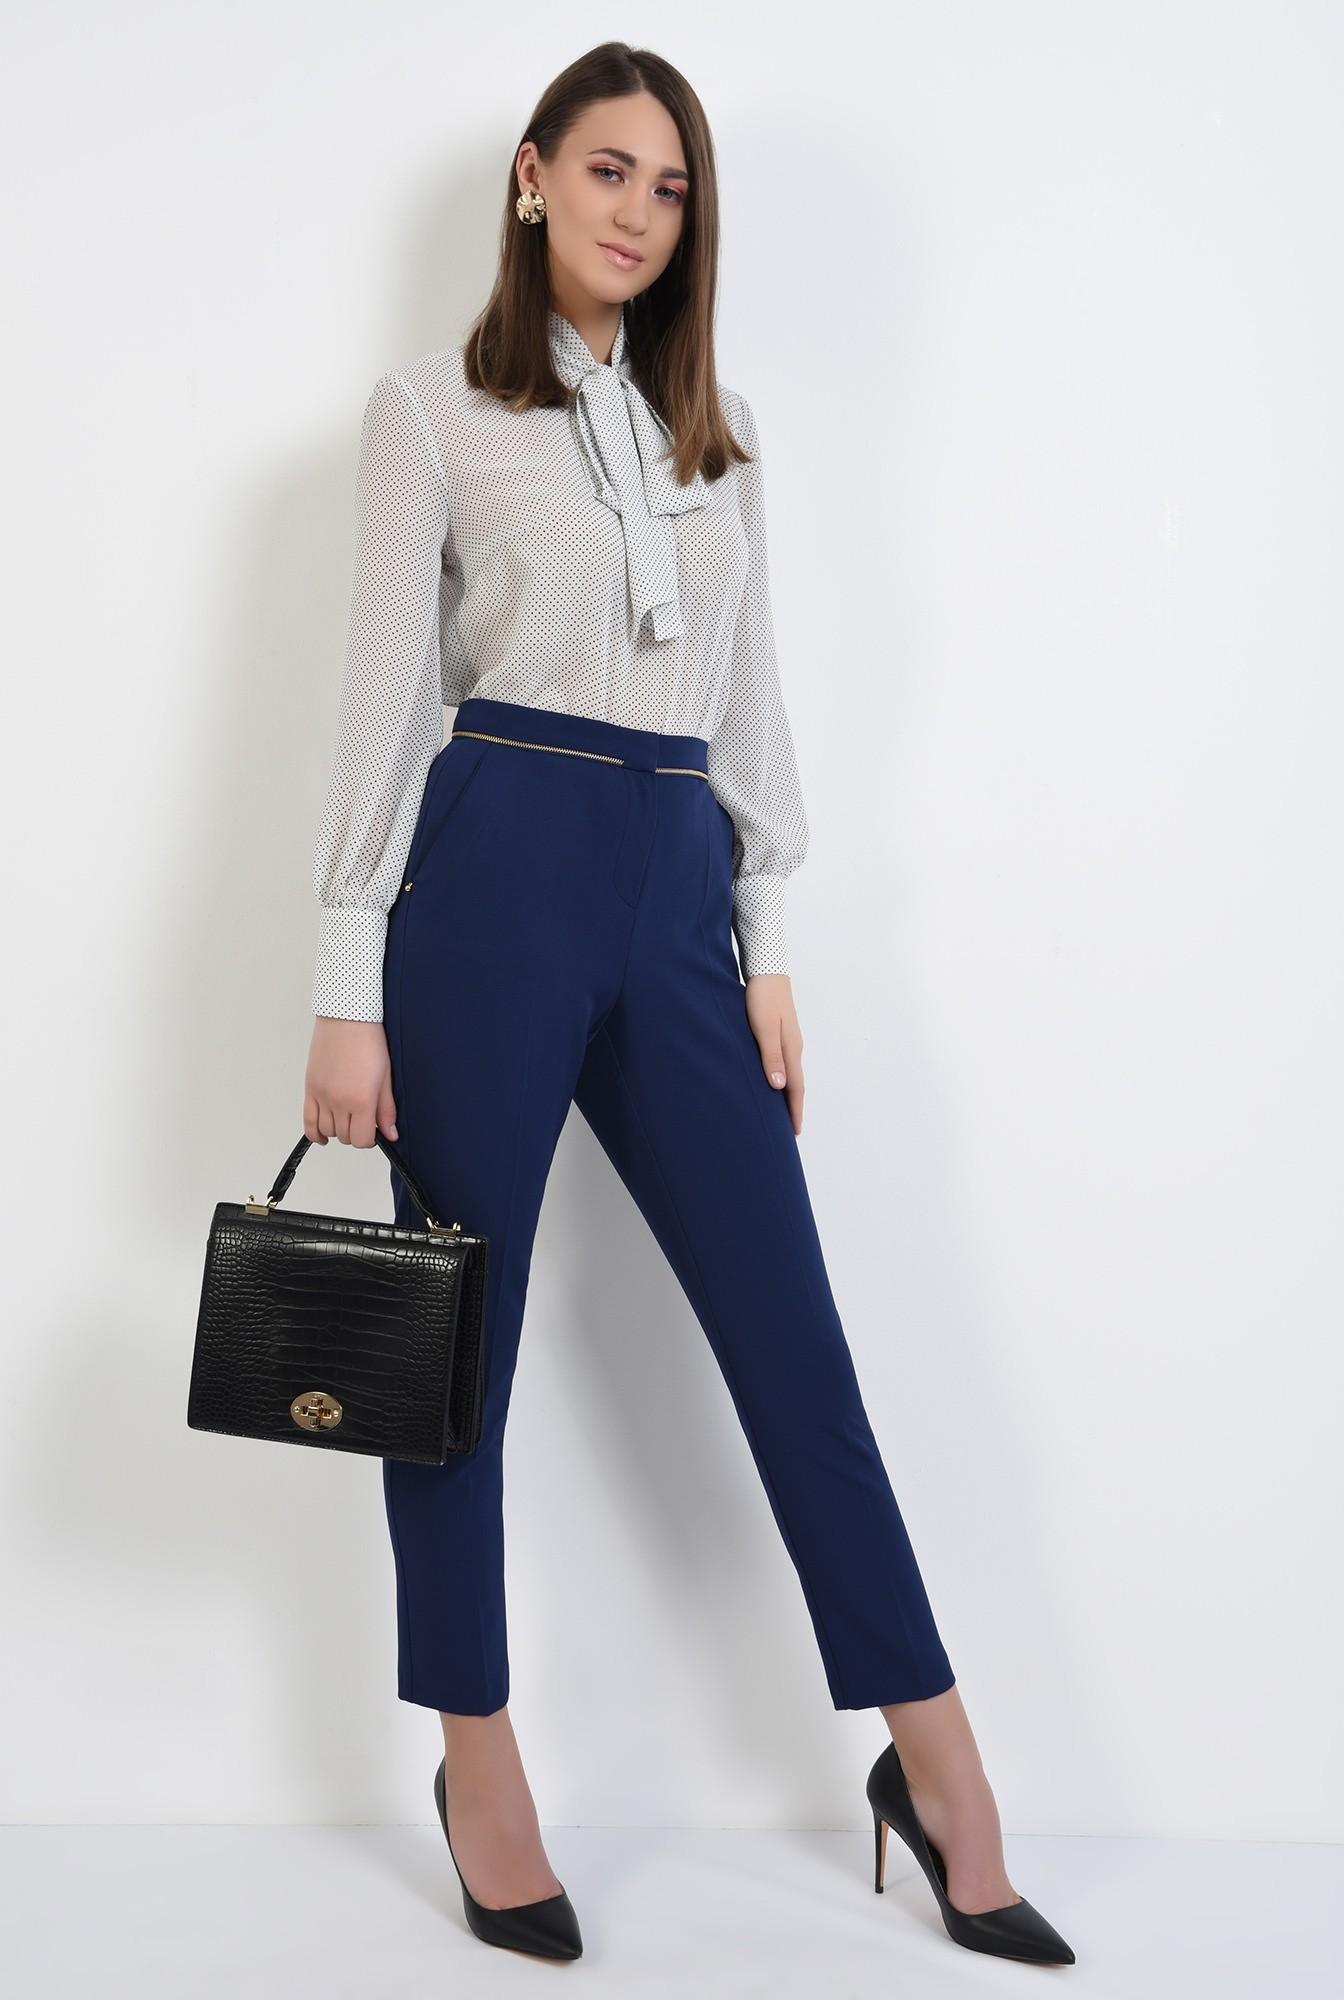 3 - pantaloni office, bleumarin, talie medie, cu buzunare, pantaloni de primavara